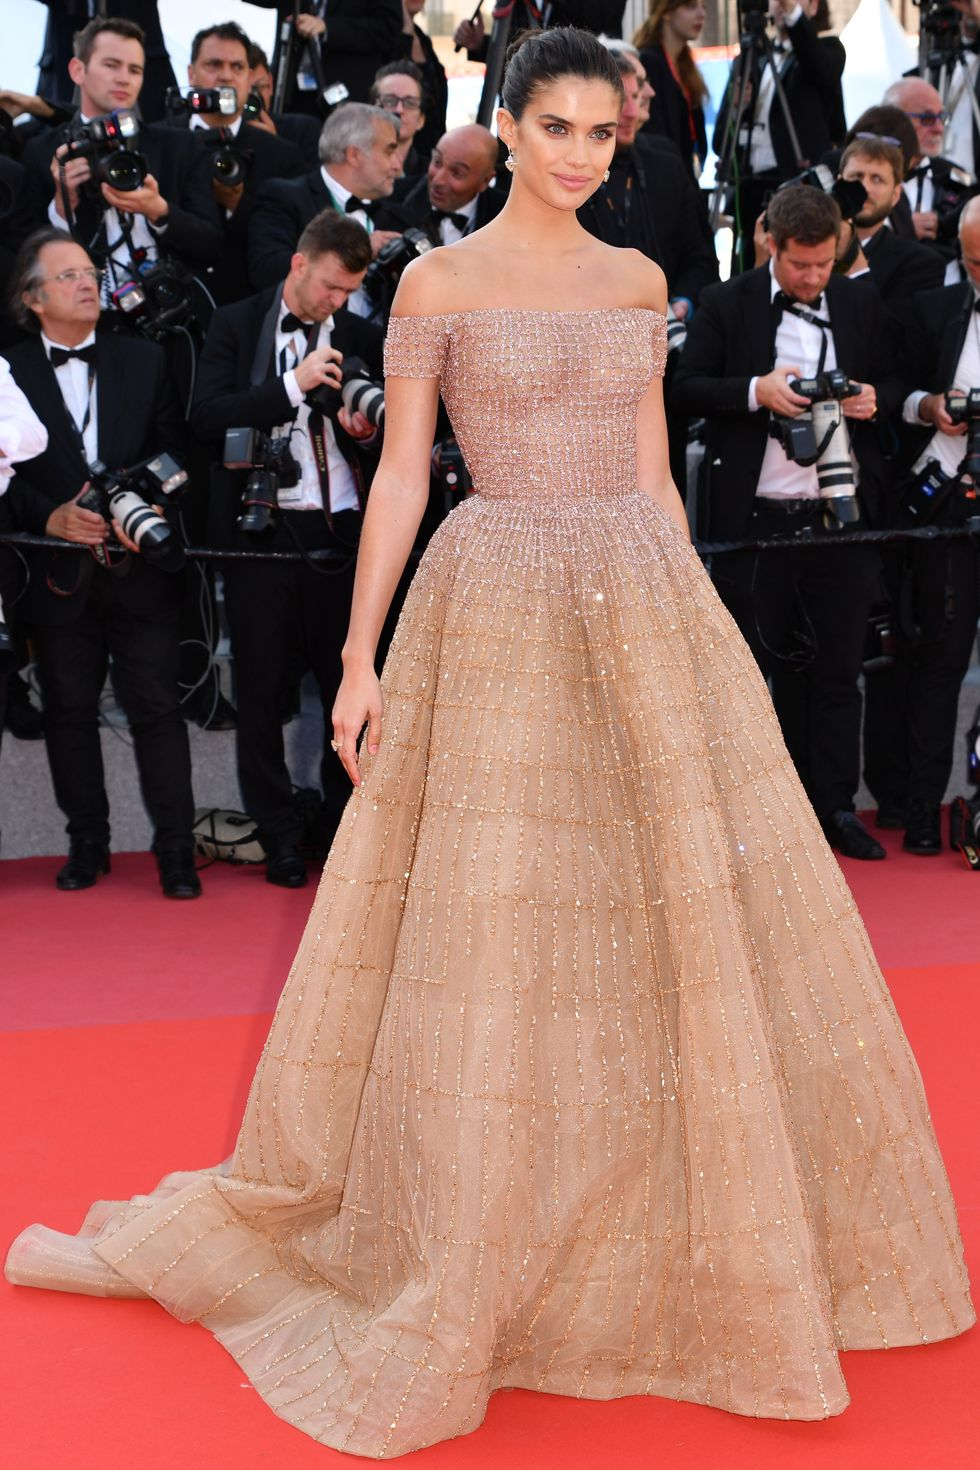 sara sampaio in a princess ellie saab dress at the cannes film festival